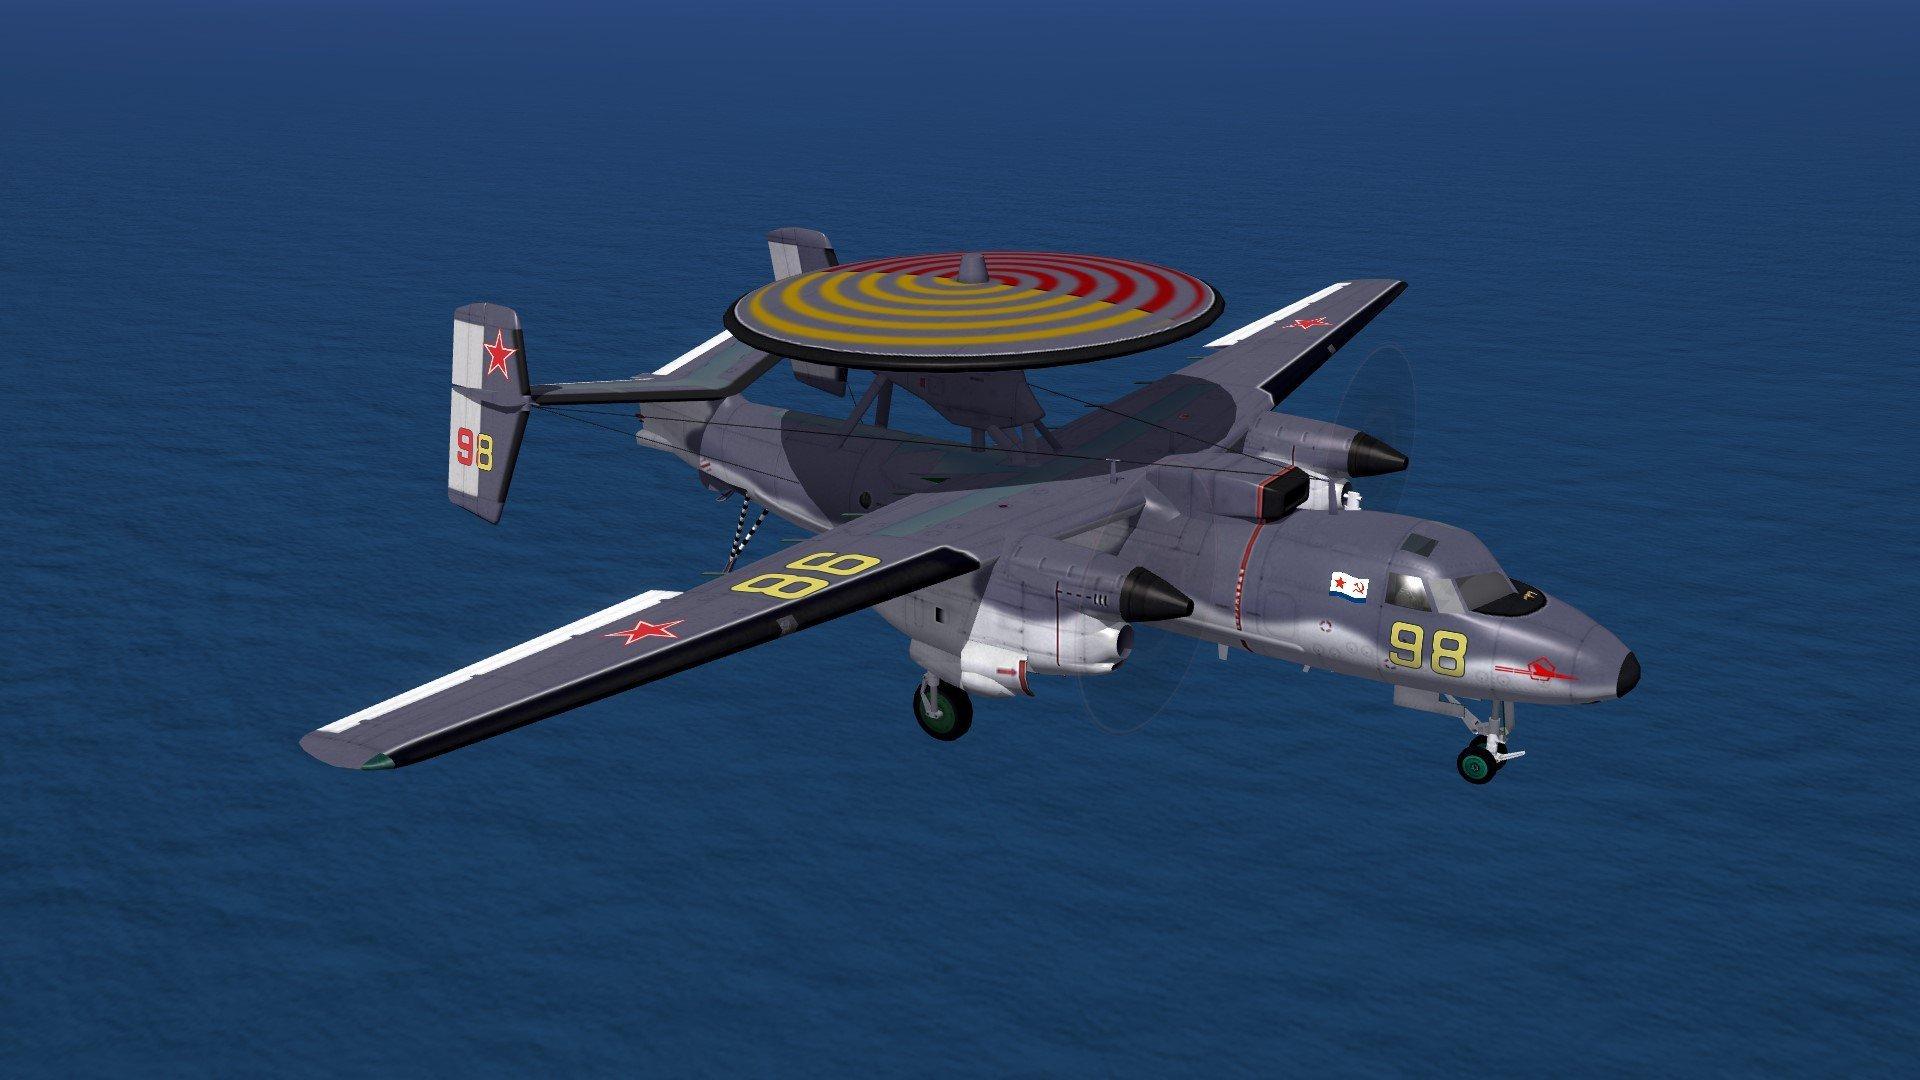 SF-2_Yak-44_AEW&C